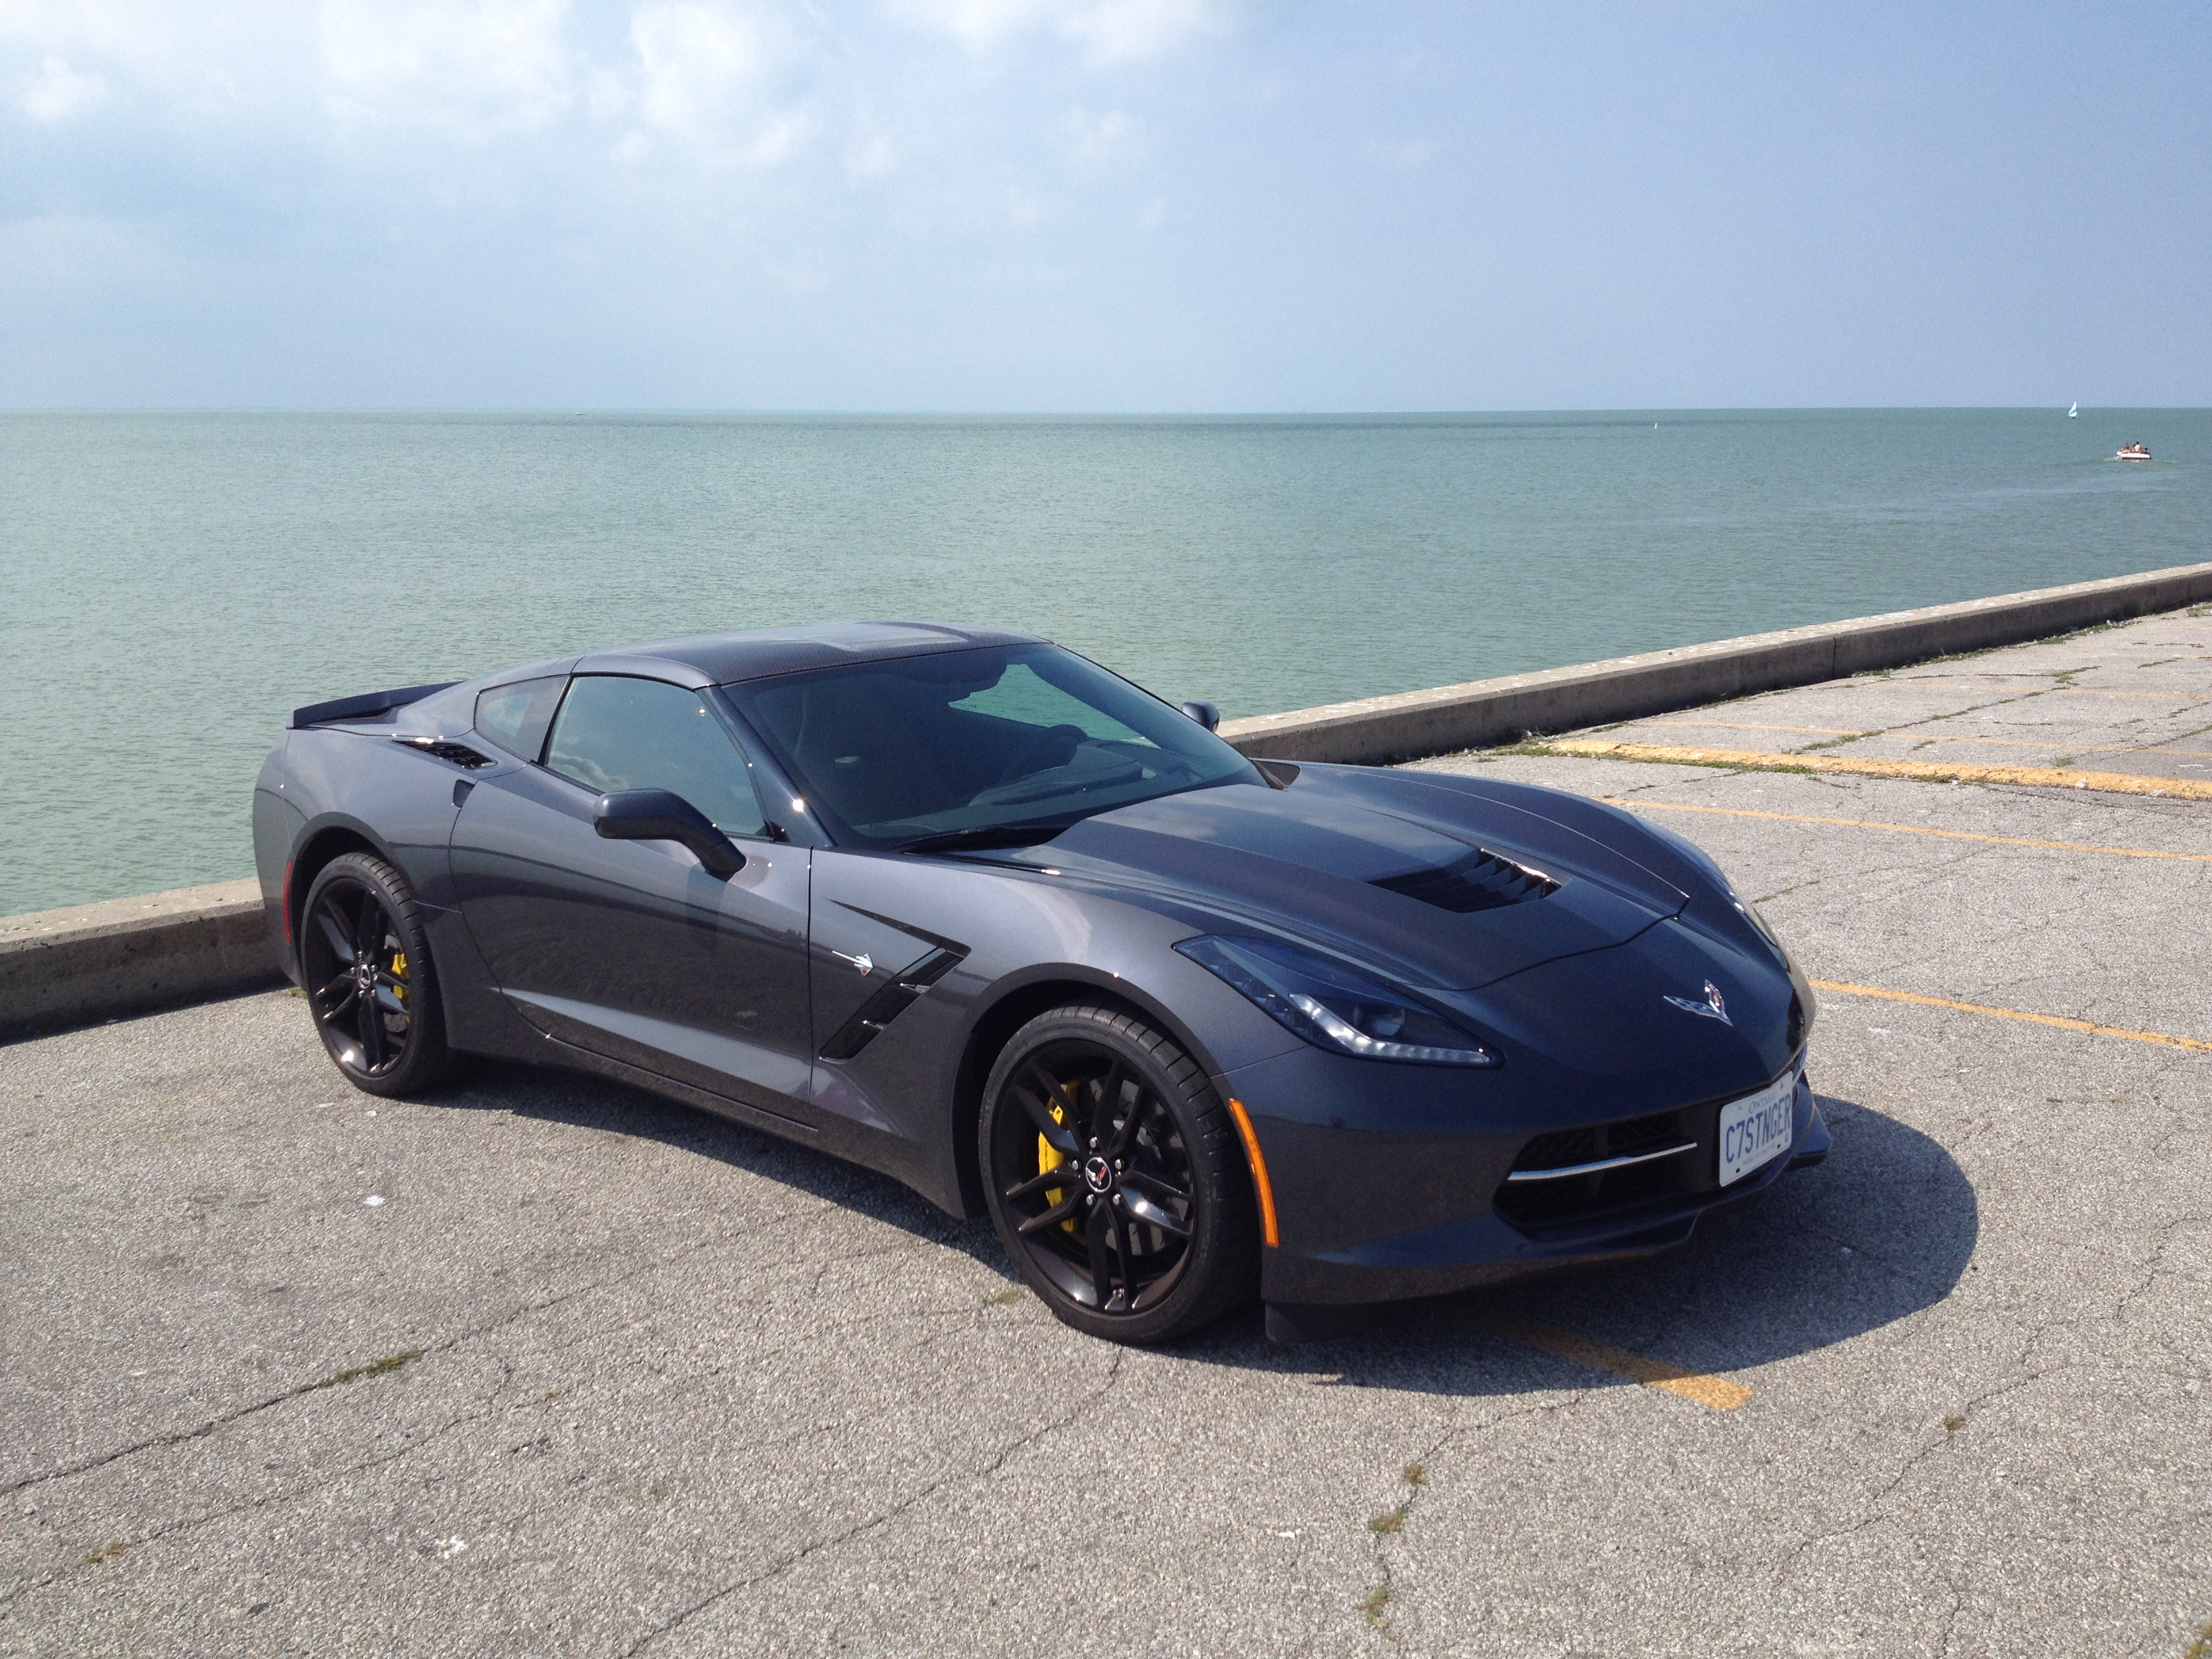 The Official Cyber Gray Stingray Corvette Photo Thread